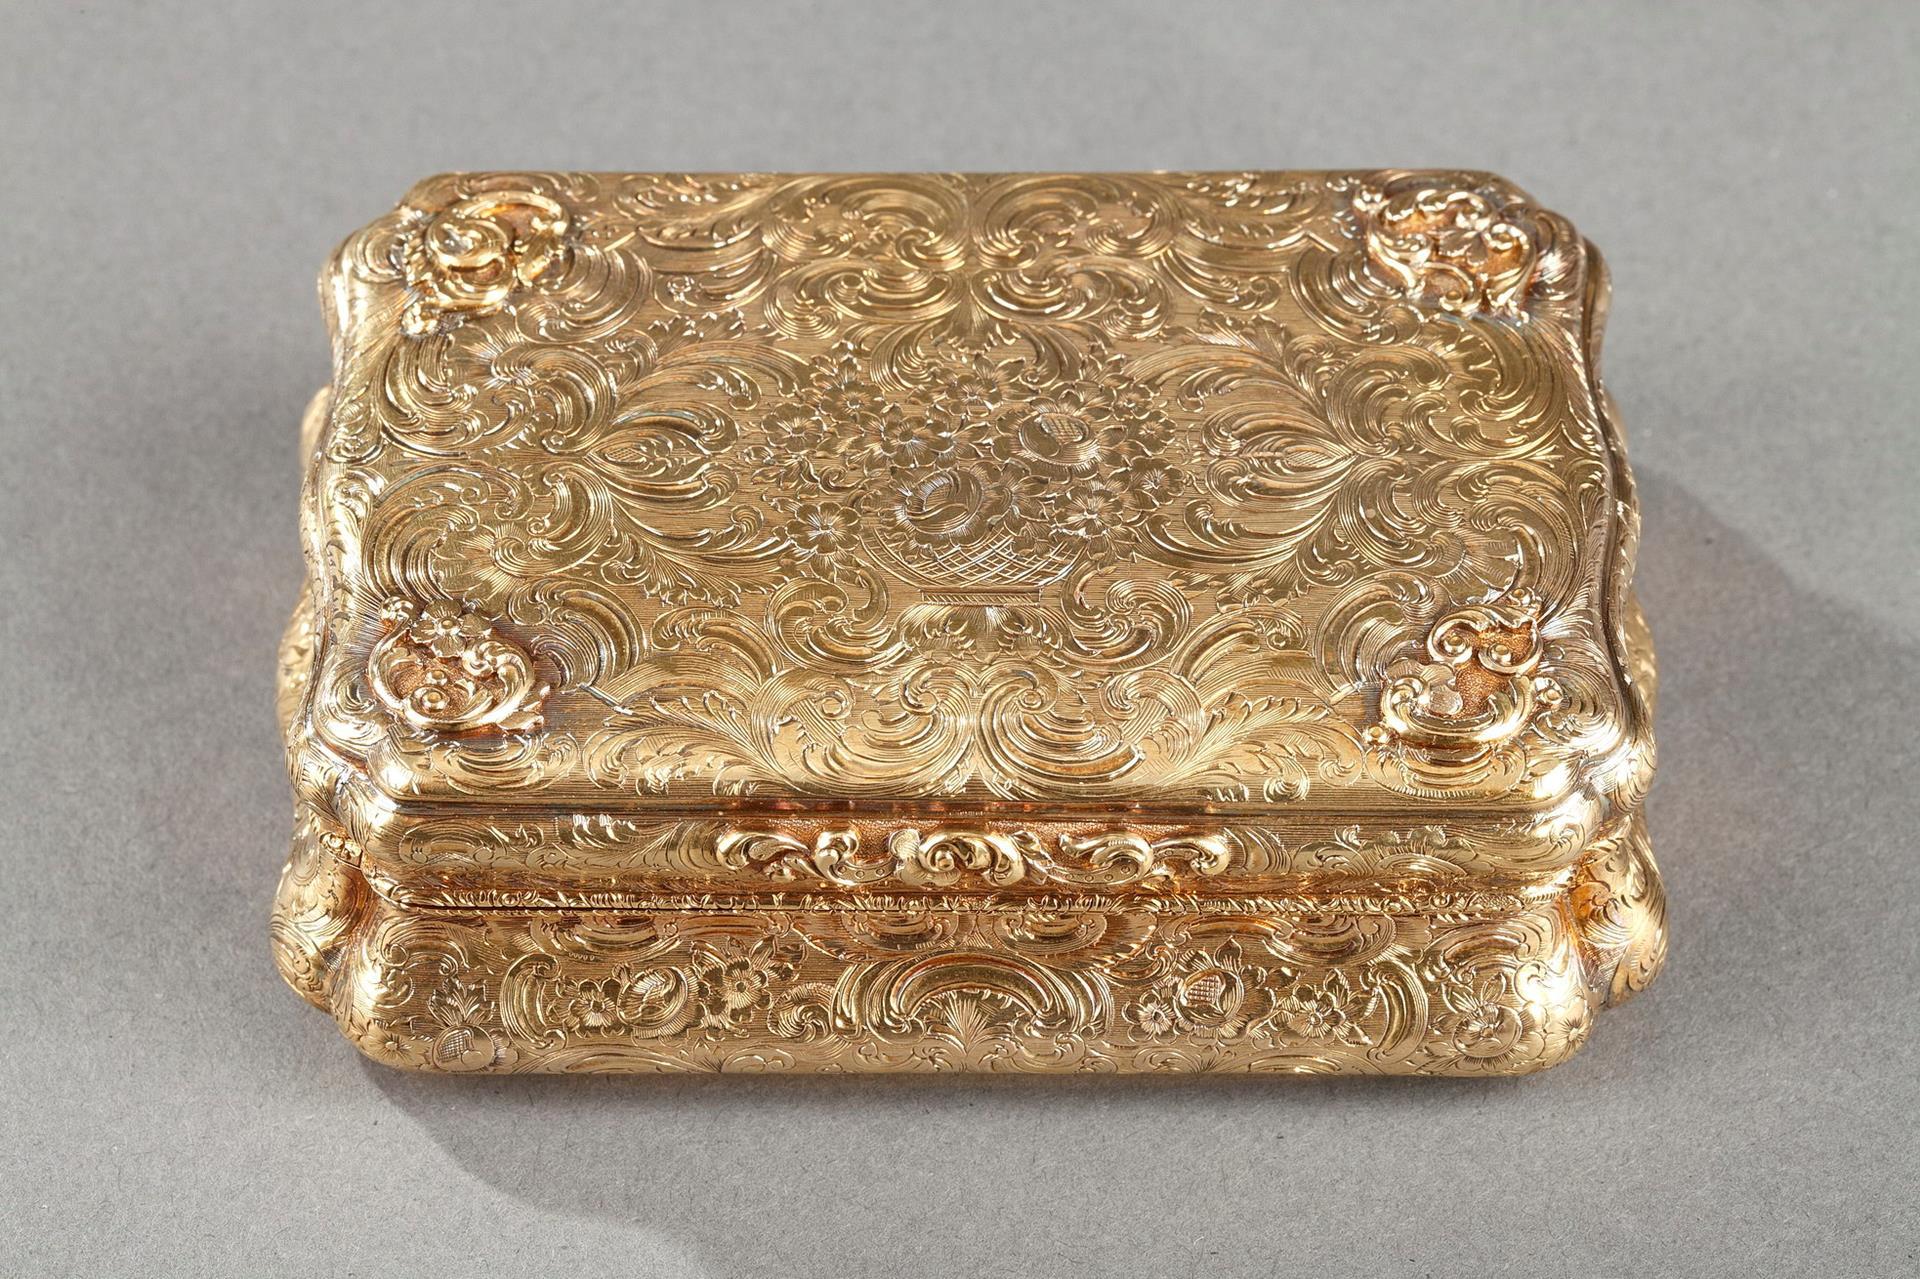 Mid-19th century Hanau Gold Box.